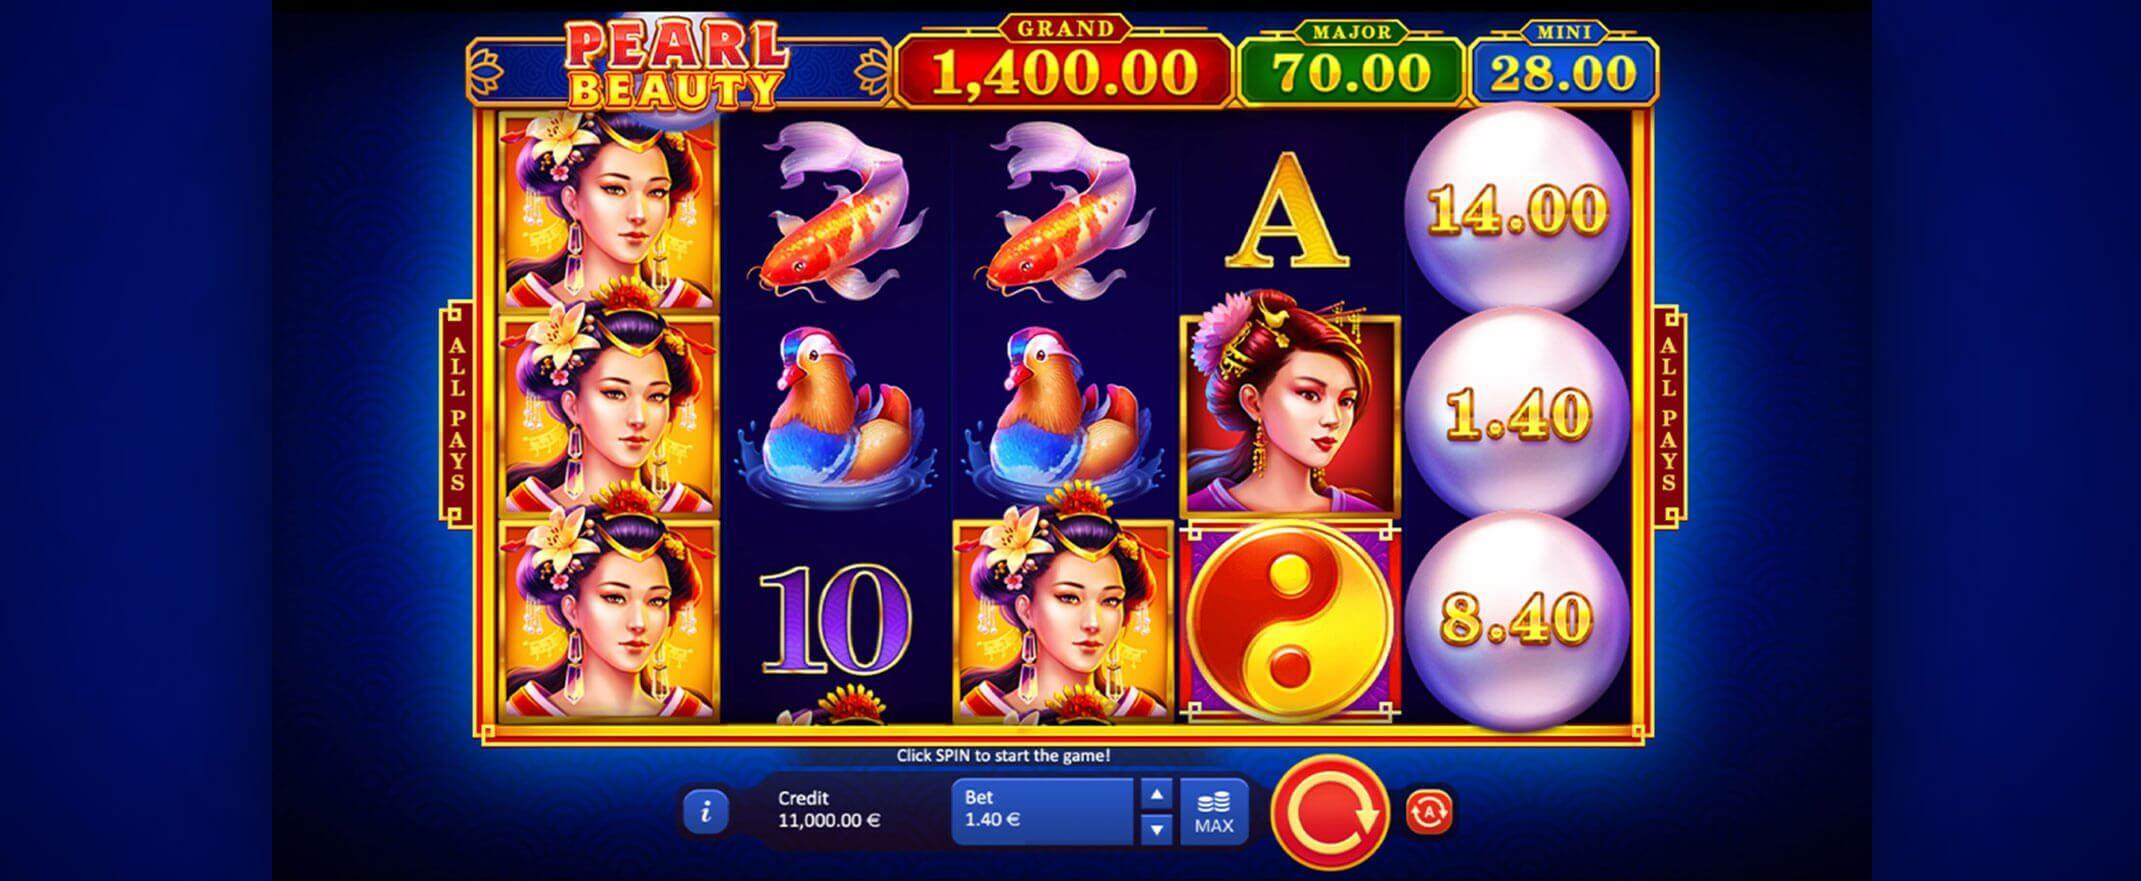 Pearl Beauty Hold and Win Slot Bonus